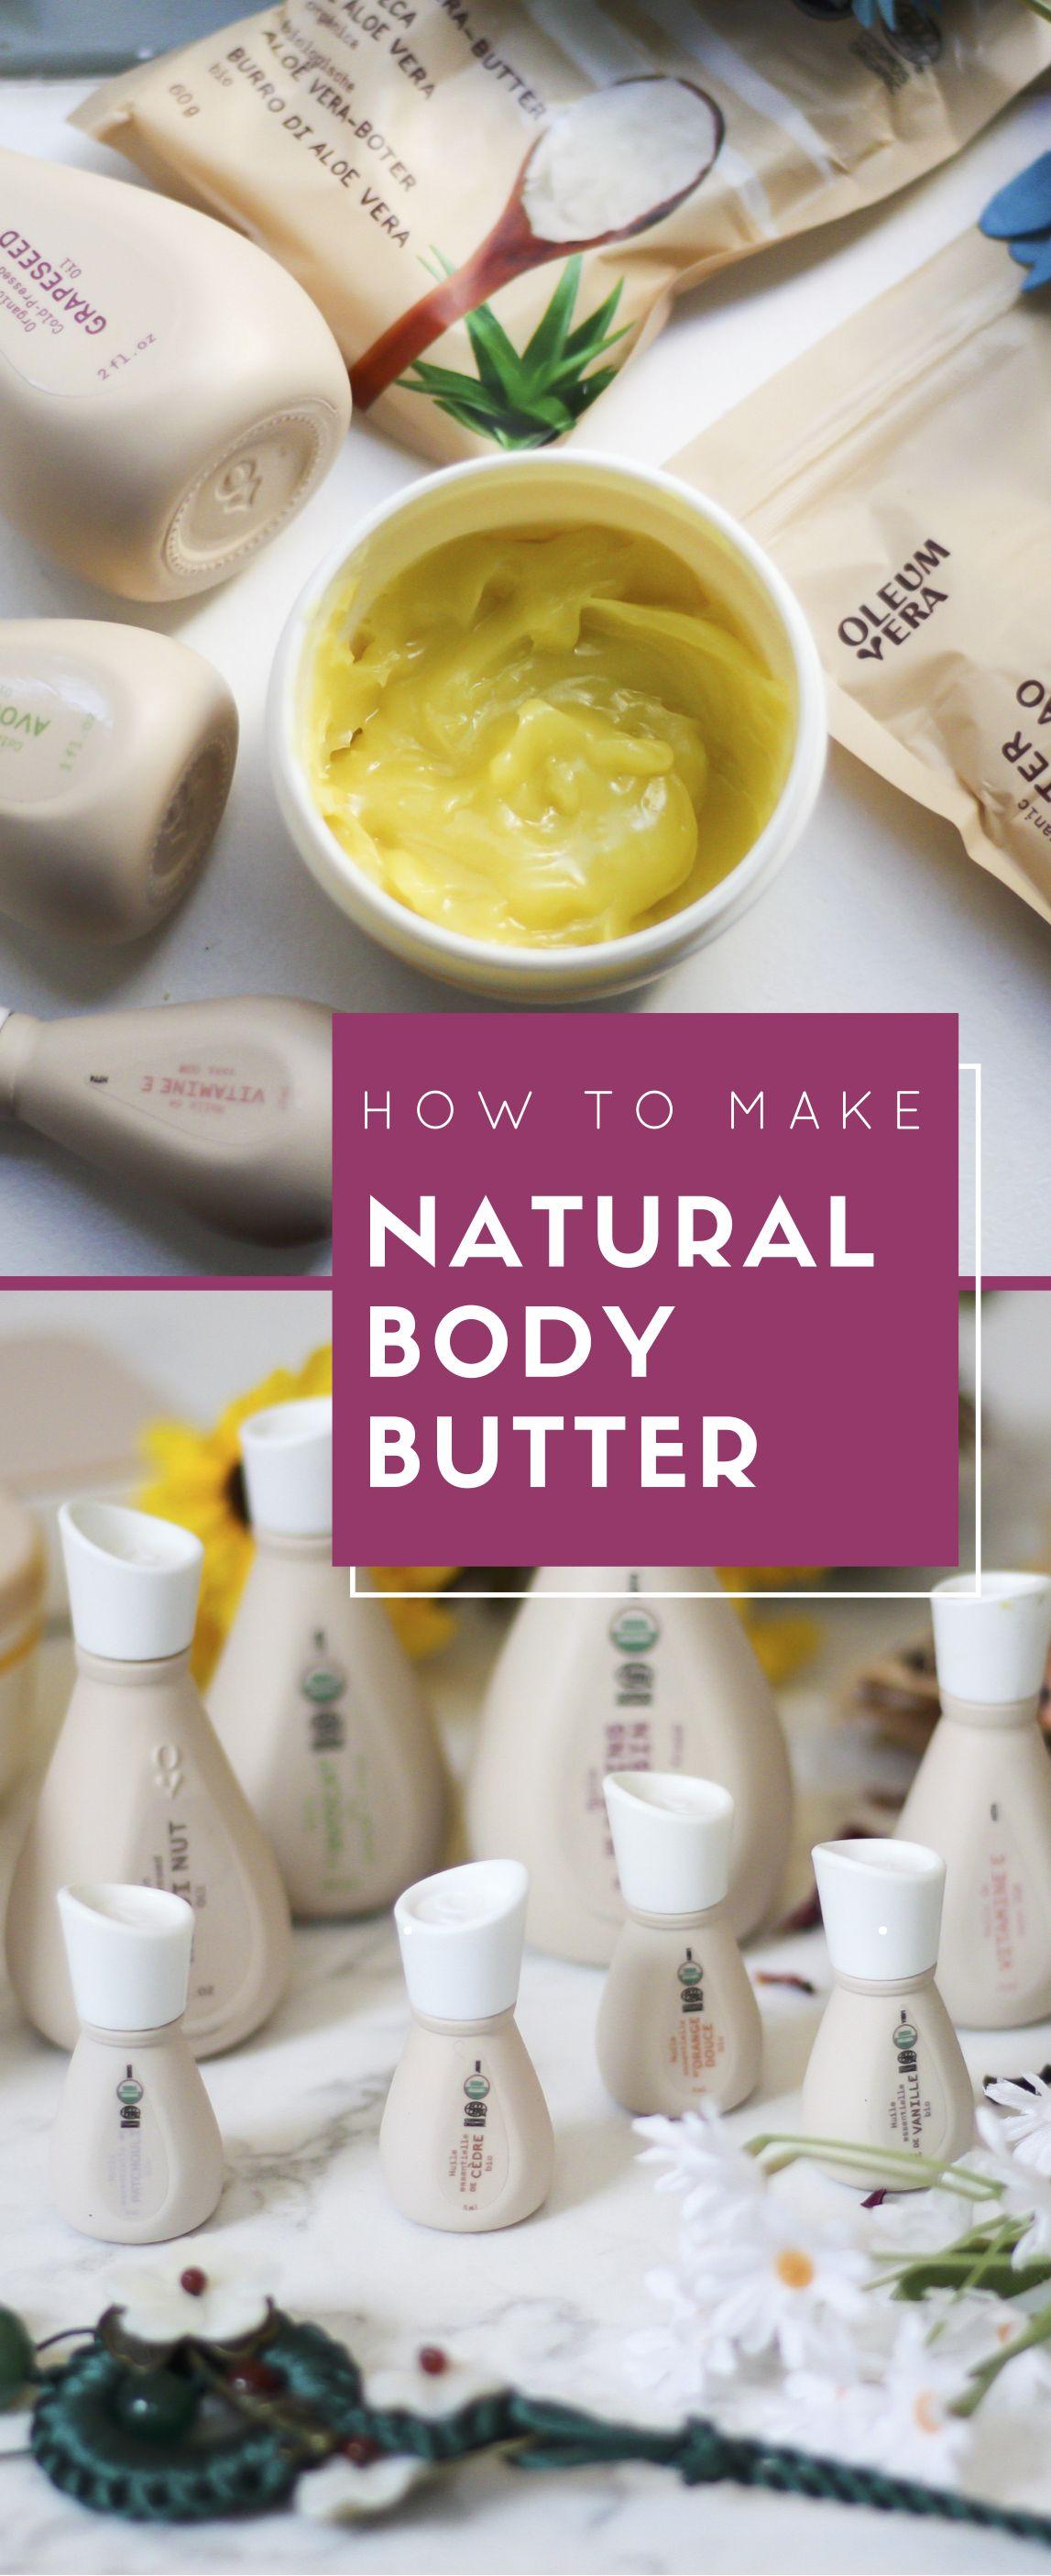 Diy skin care with oleum vera body butter recipe layers